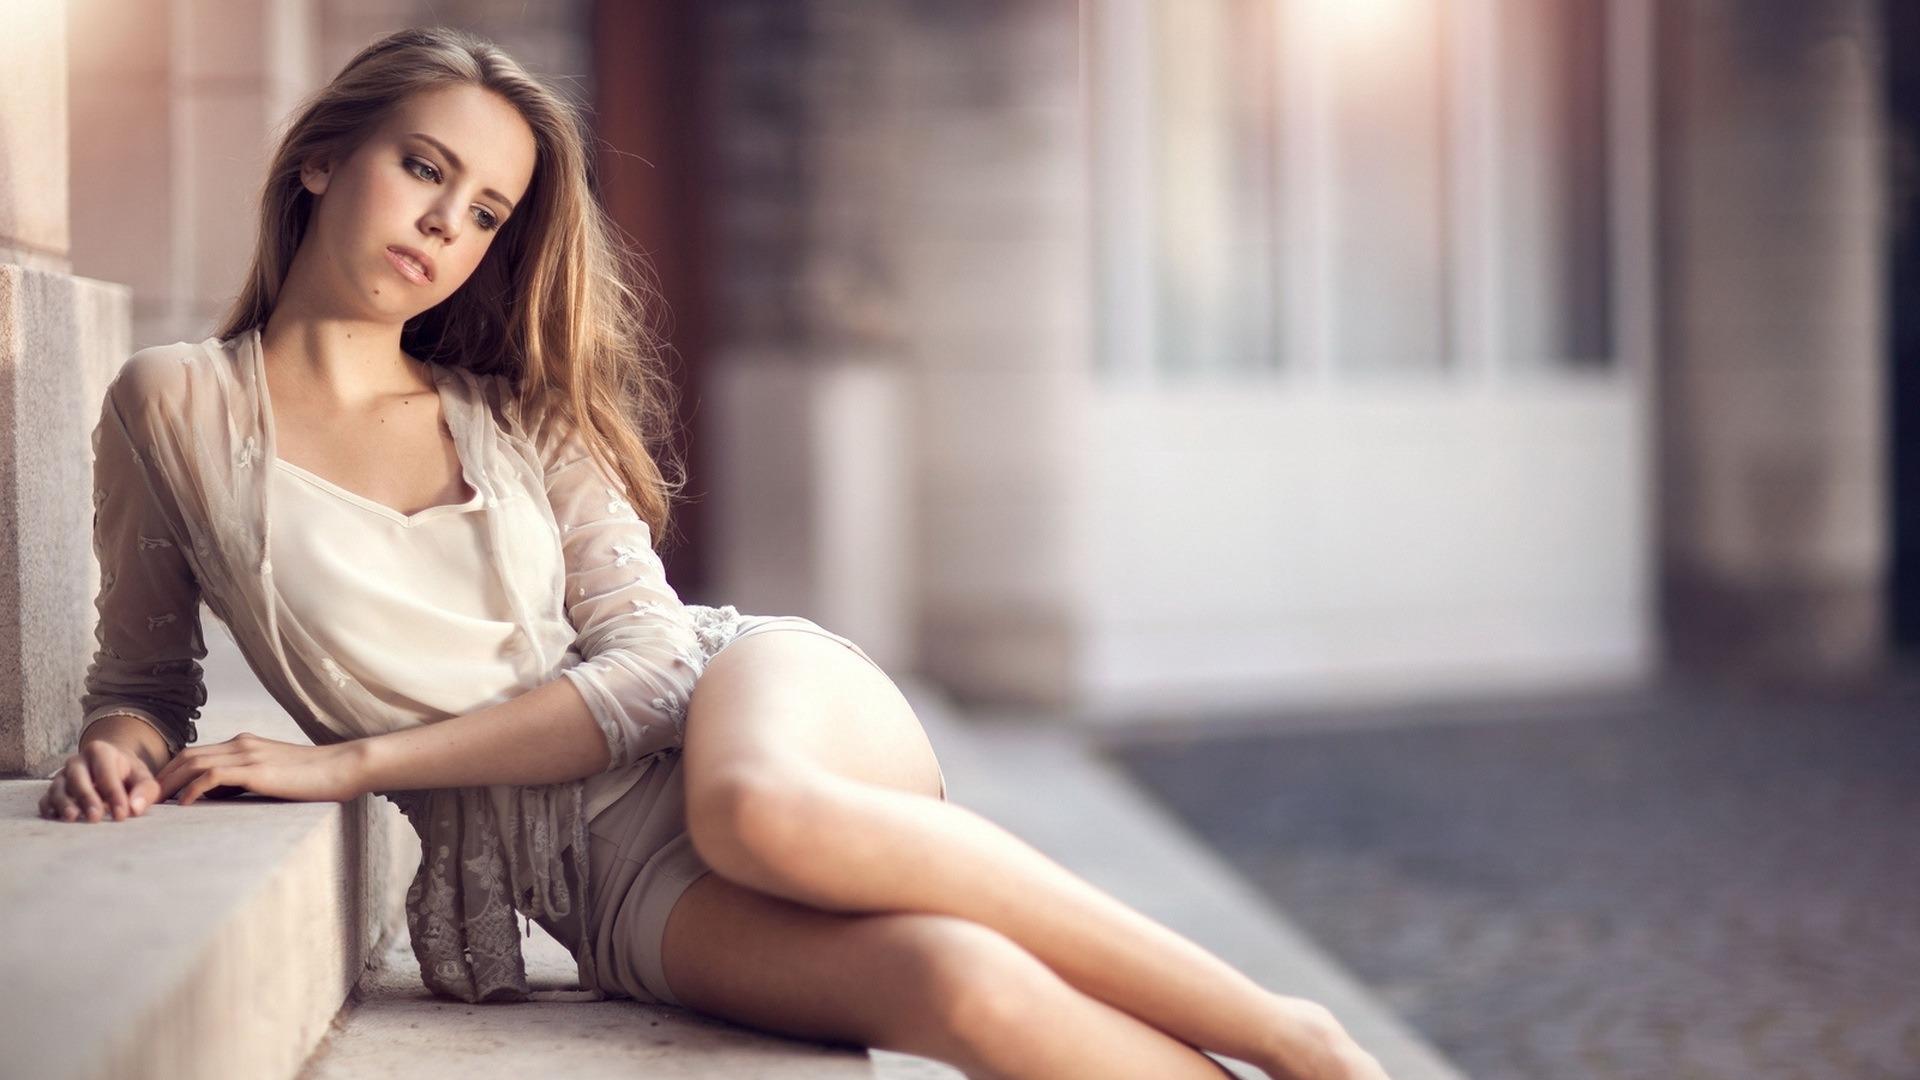 Romantic Sexy Girl High Quality Hd Wallpaper Avance